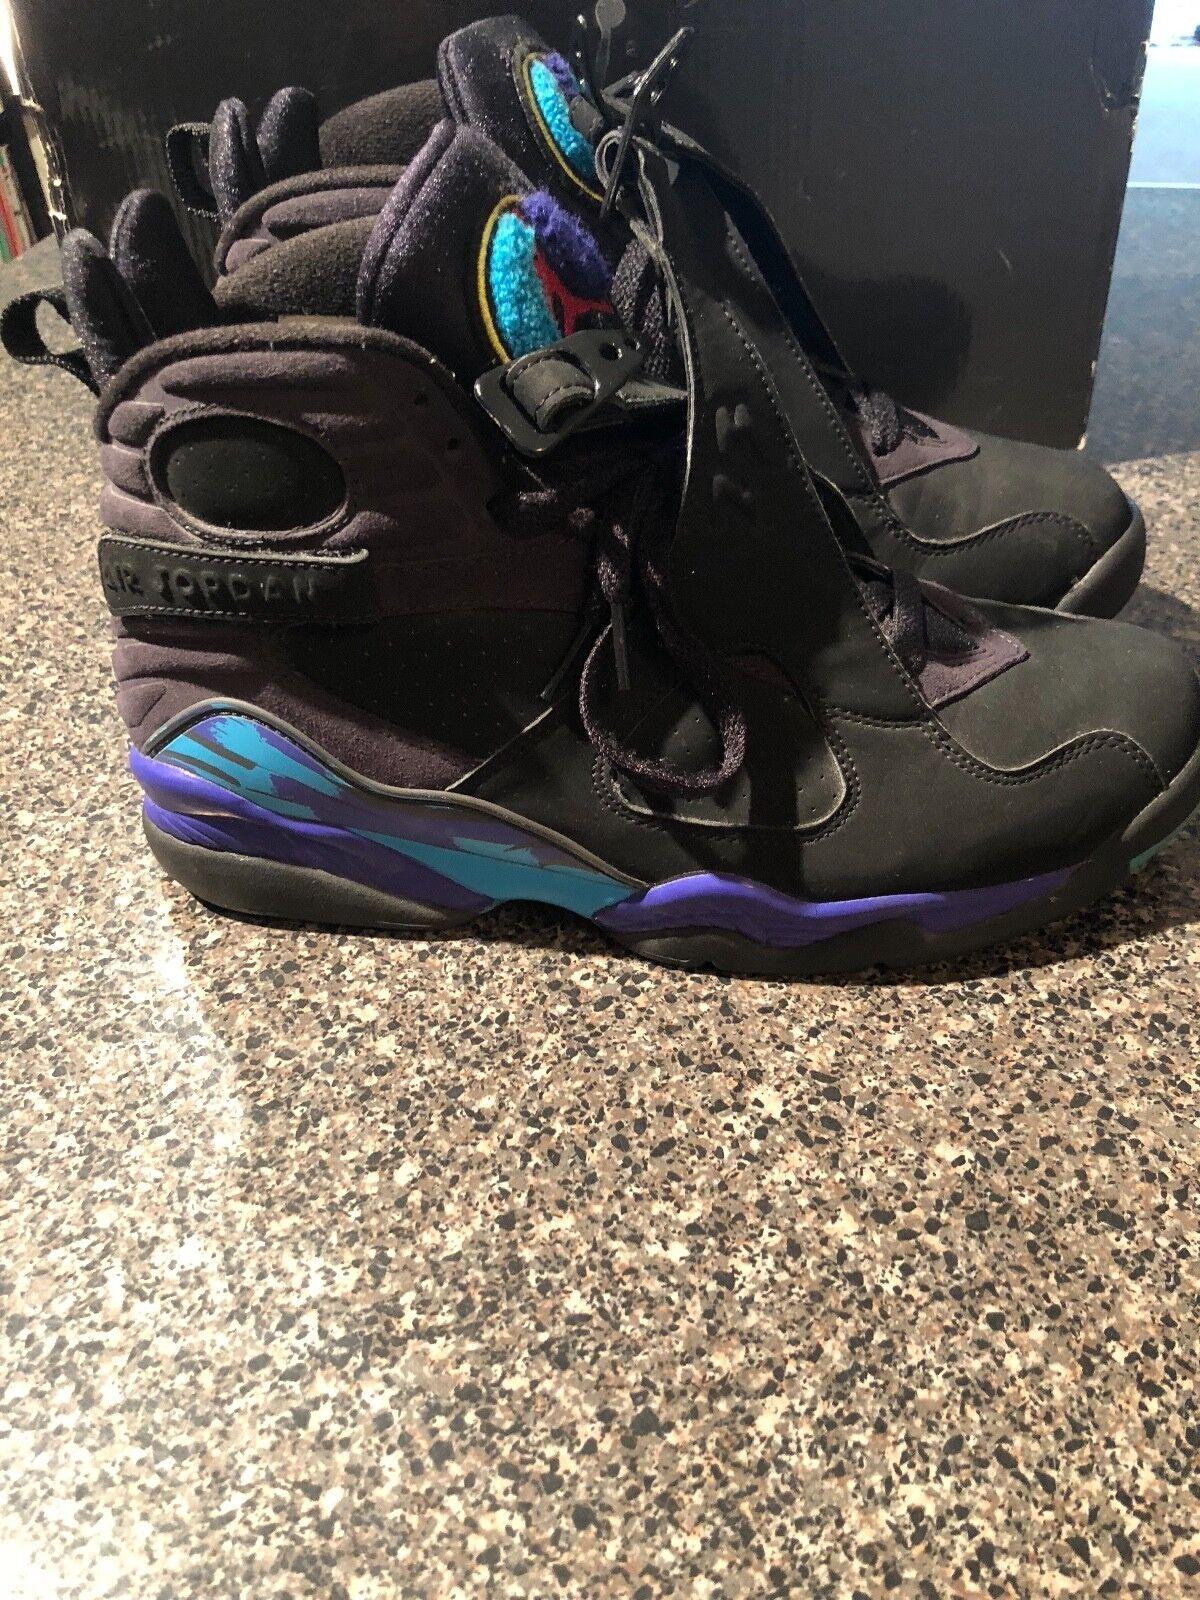 2018 Nike Air Jordan Retro 8 Aqua size 9.5 Wild casual shoes